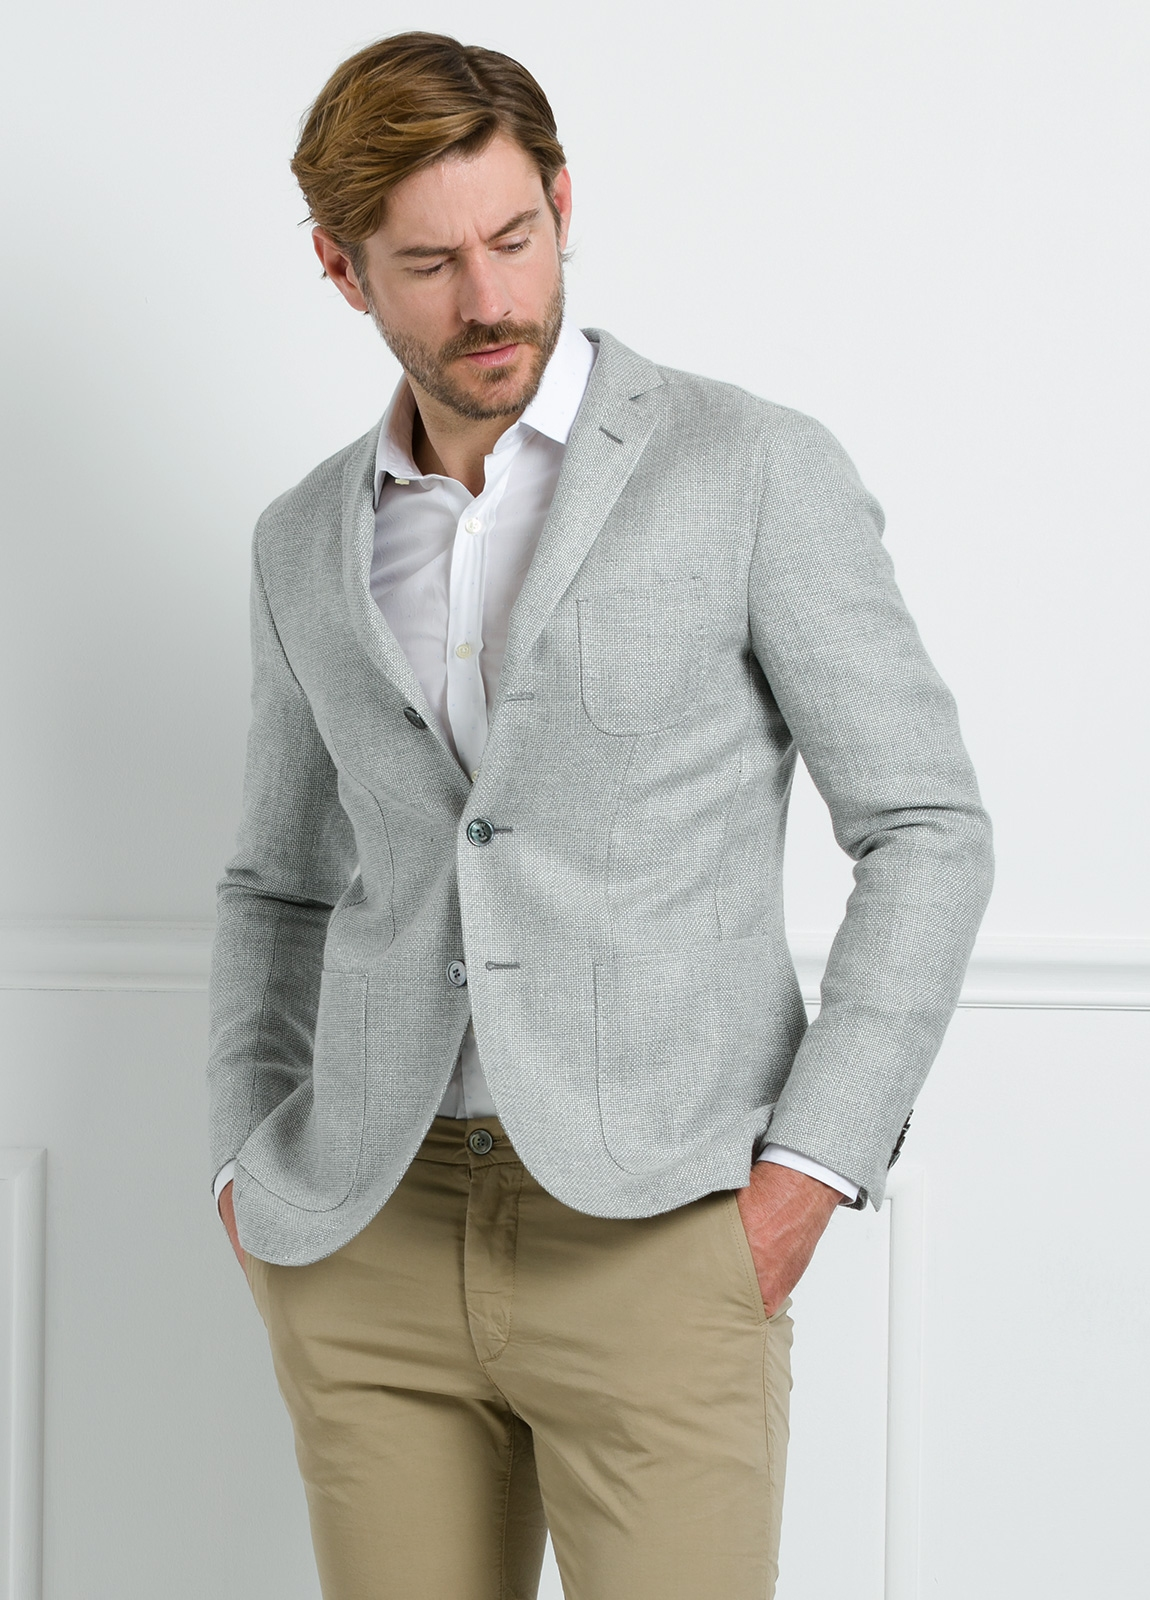 Americana SOFT JACKET Slim Fit textura color gris. 75% Cáñamo 25% lana.